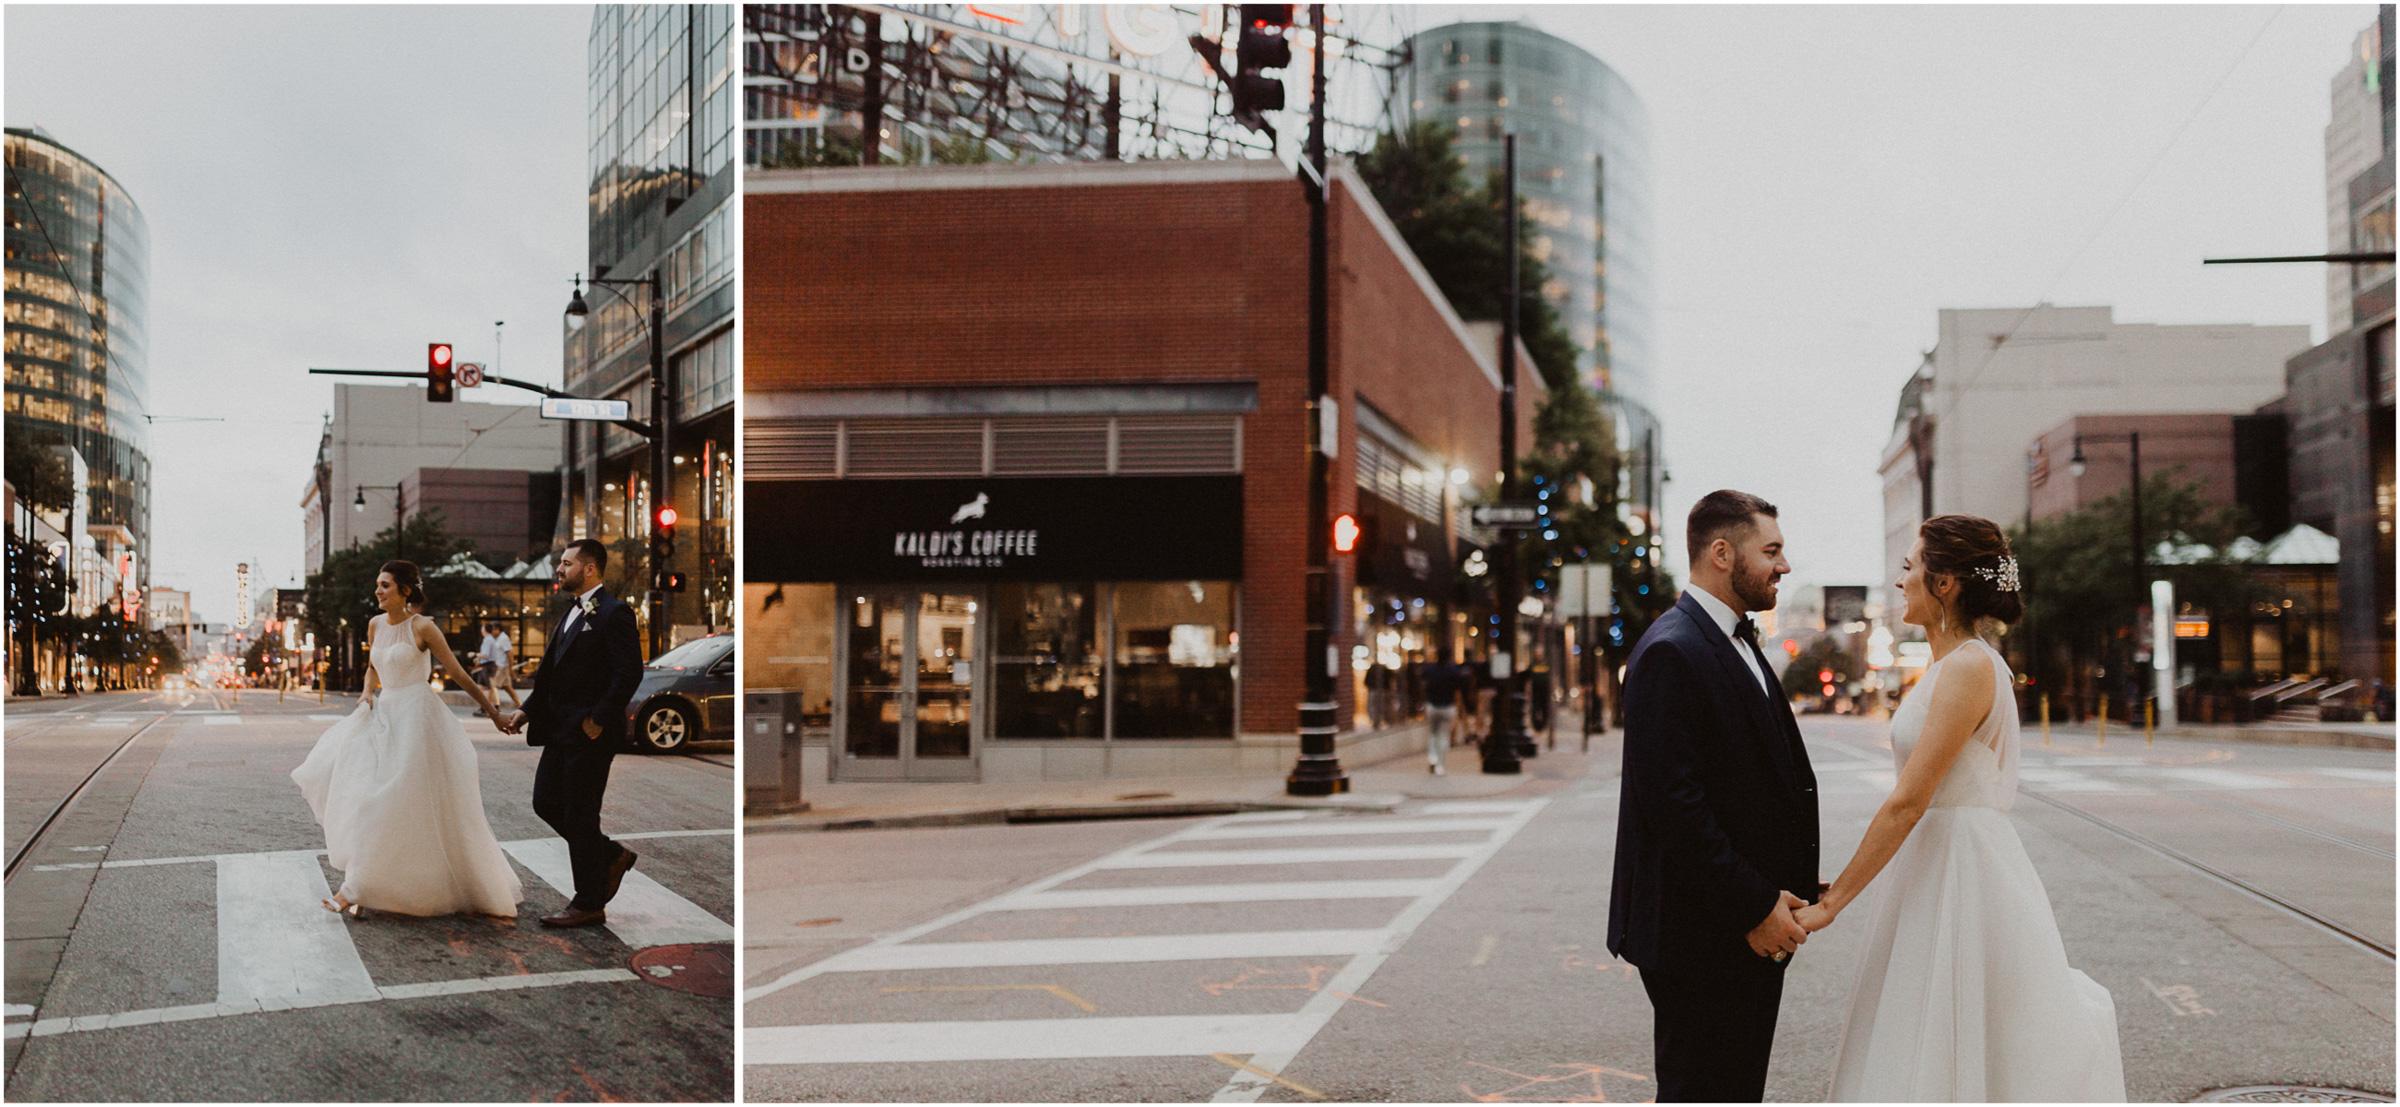 alyssa barletter photography classic downtown kansas city wedding boulevard brewery-61.jpg